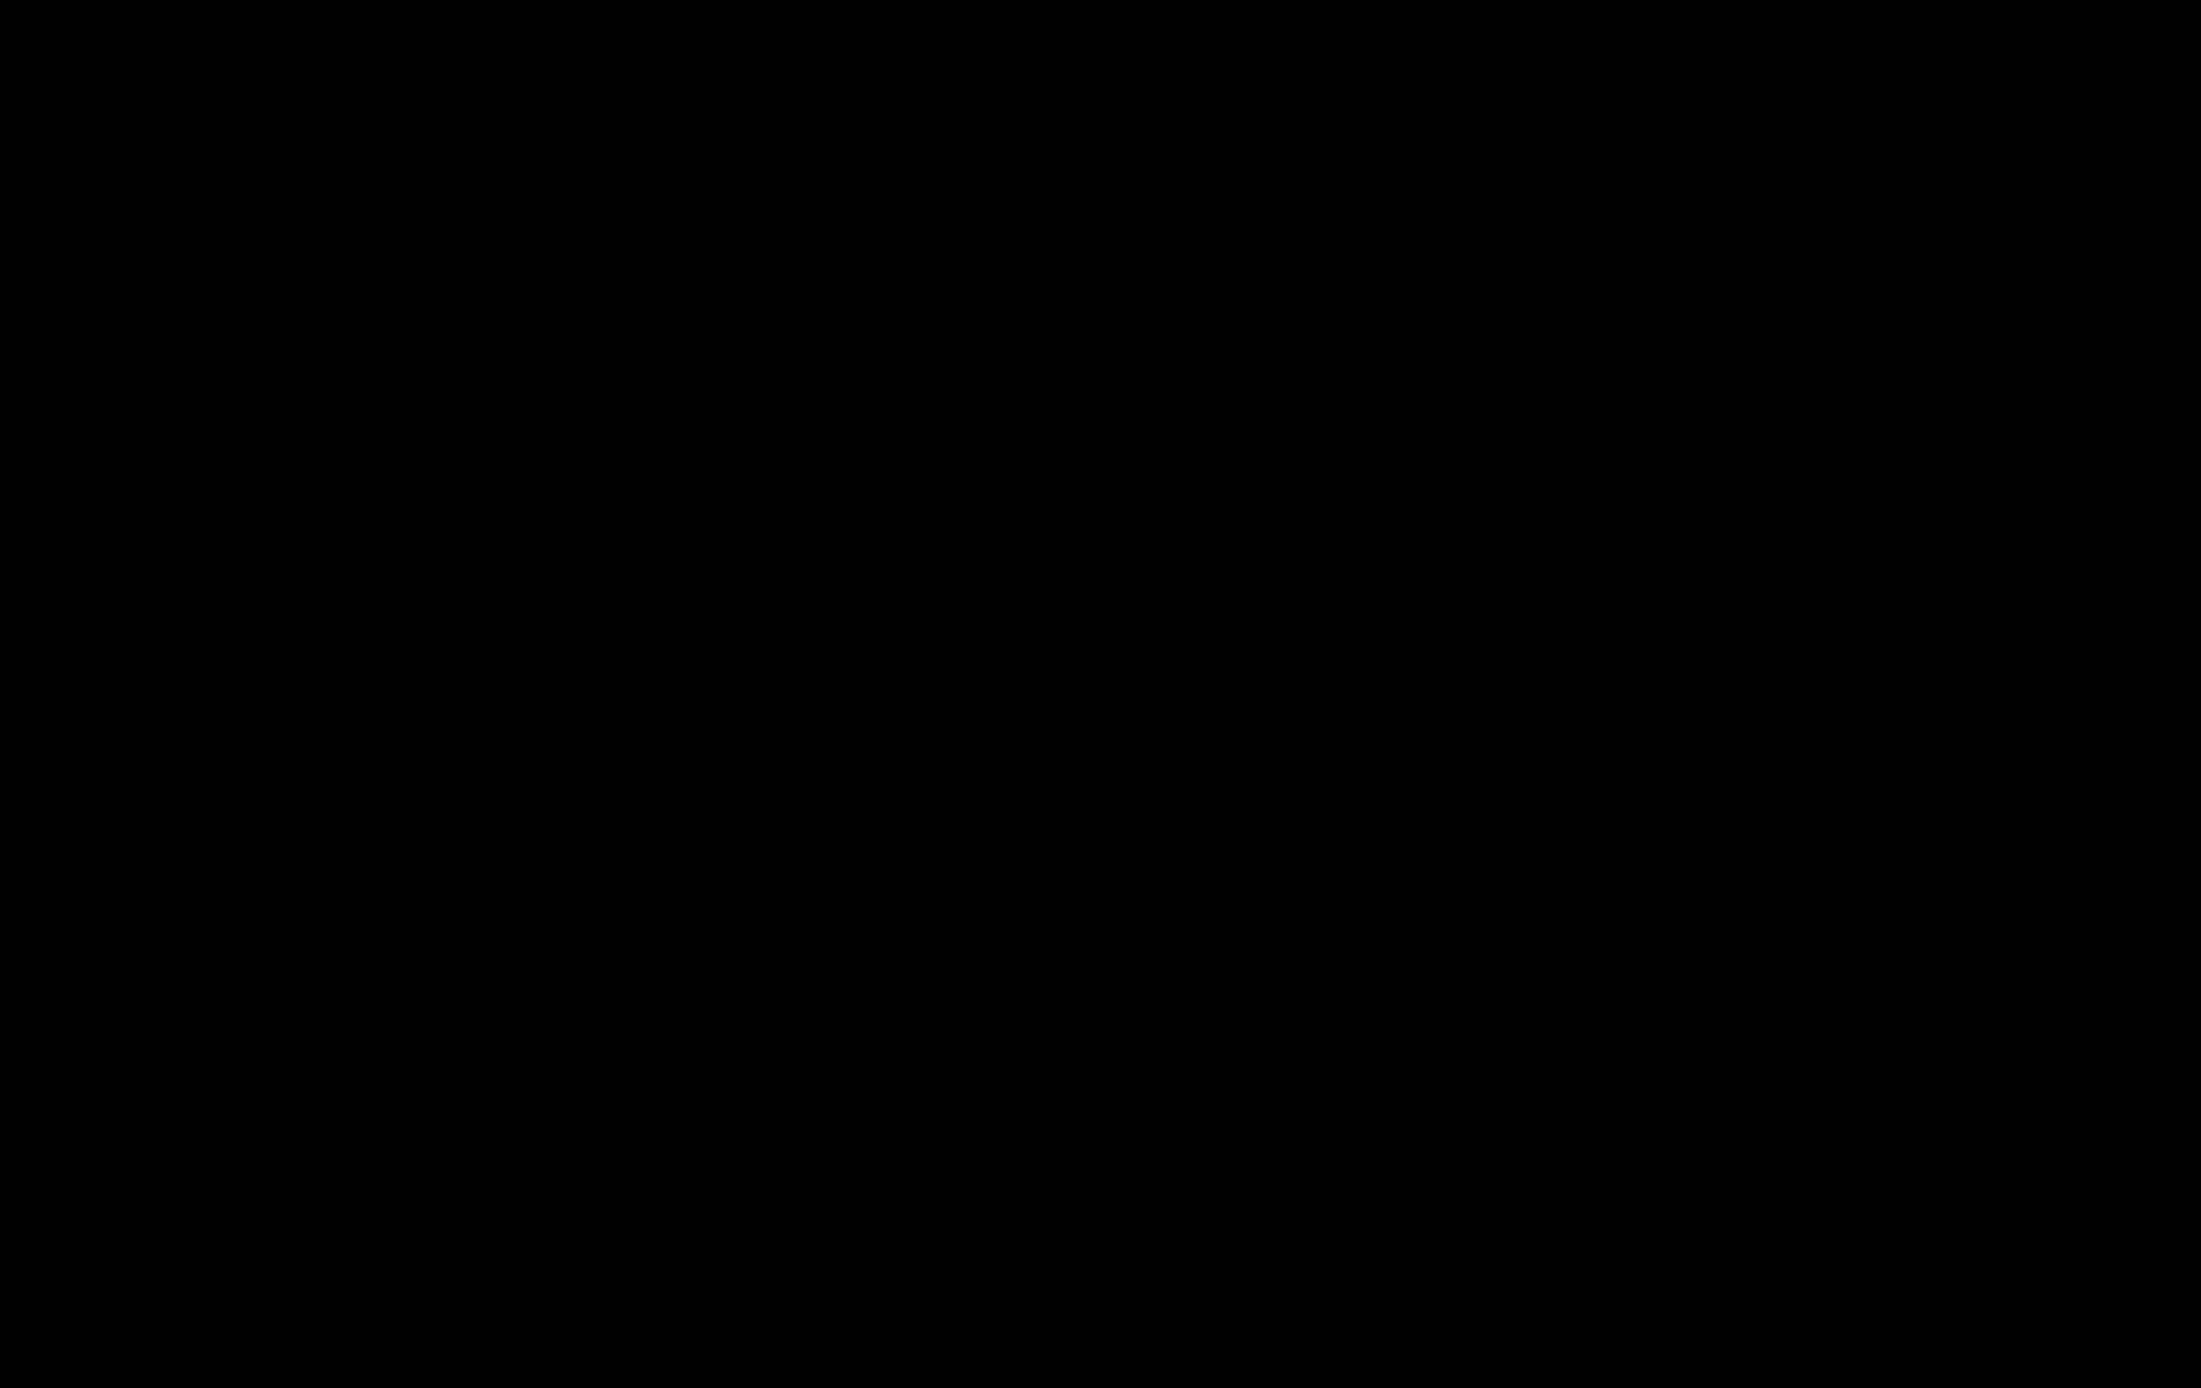 Pointer Beagle Silhouette Clip art.